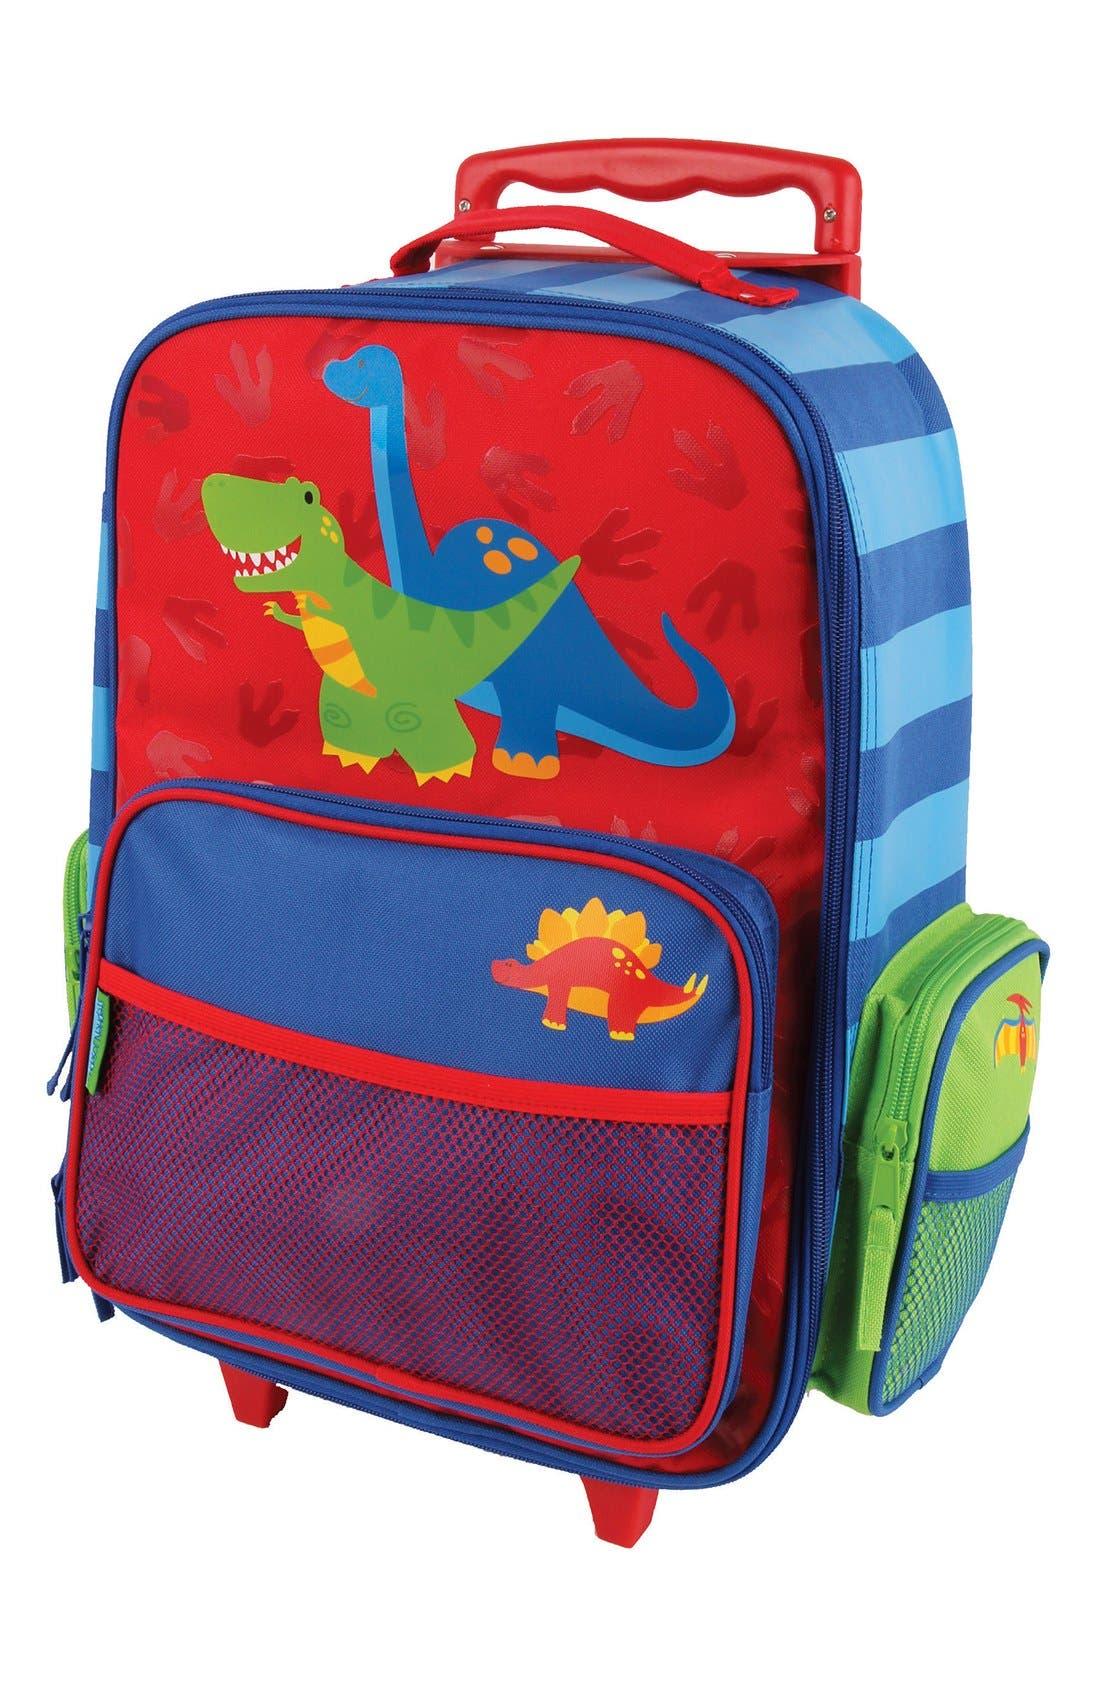 STEPHEN JOSEPH Rolling Suitcase